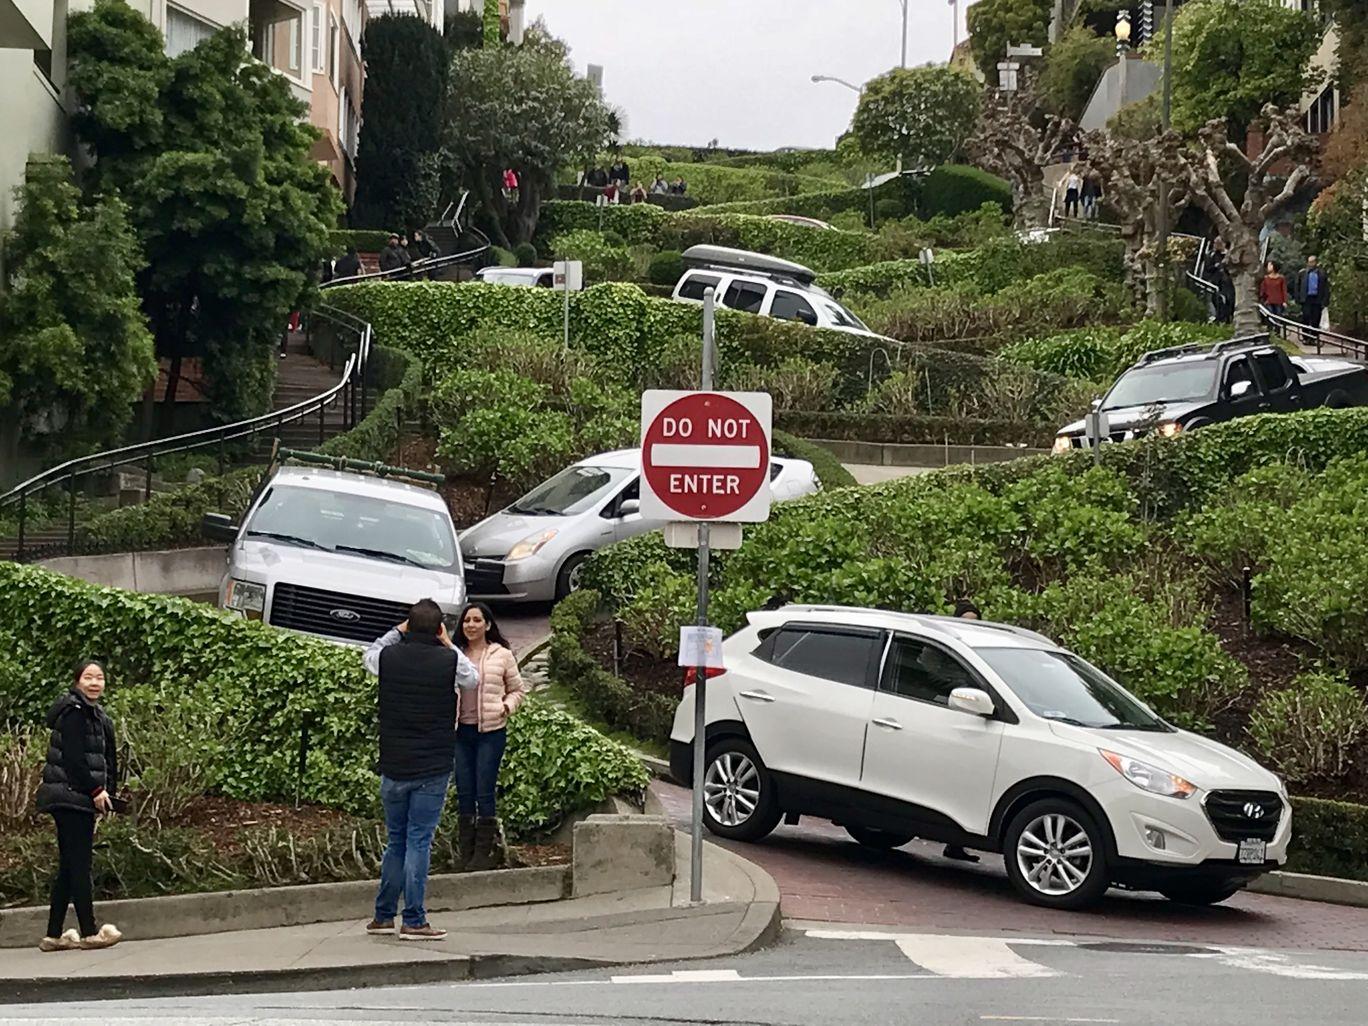 Photo of San Francisco By Nikita Mathur